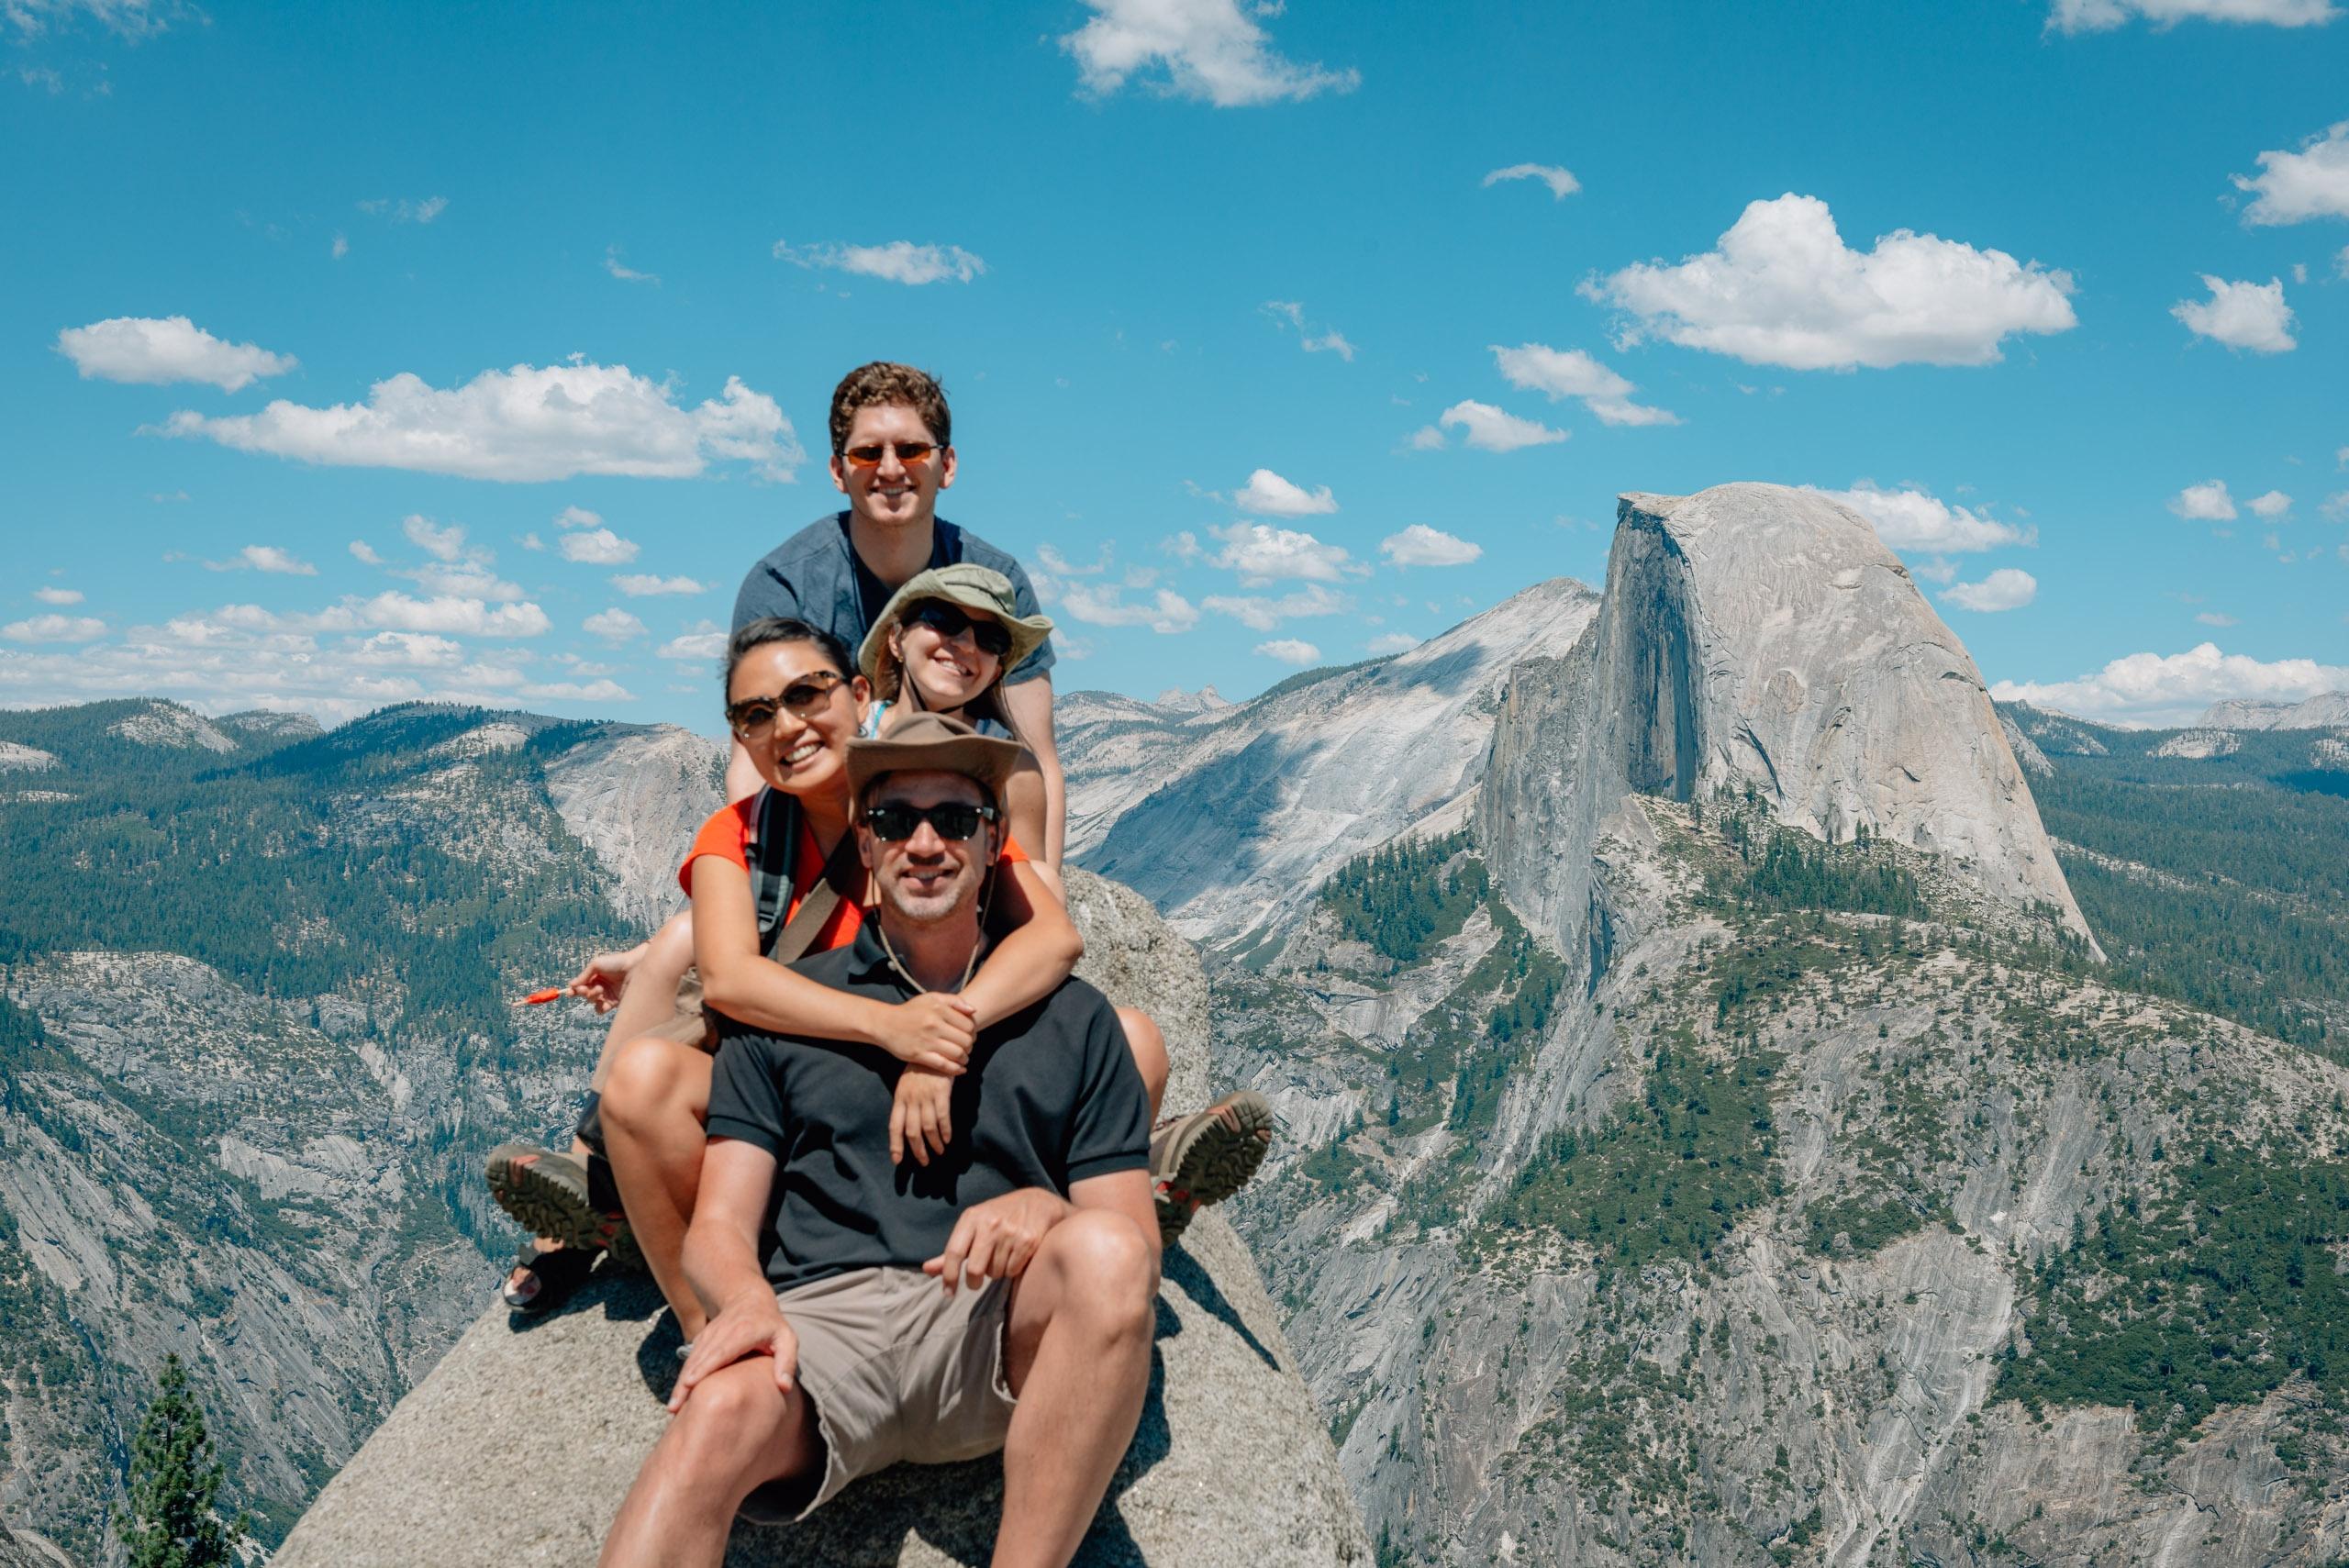 Yosemite National Park - 2012 - 2012-0721-DSC_0201_77696